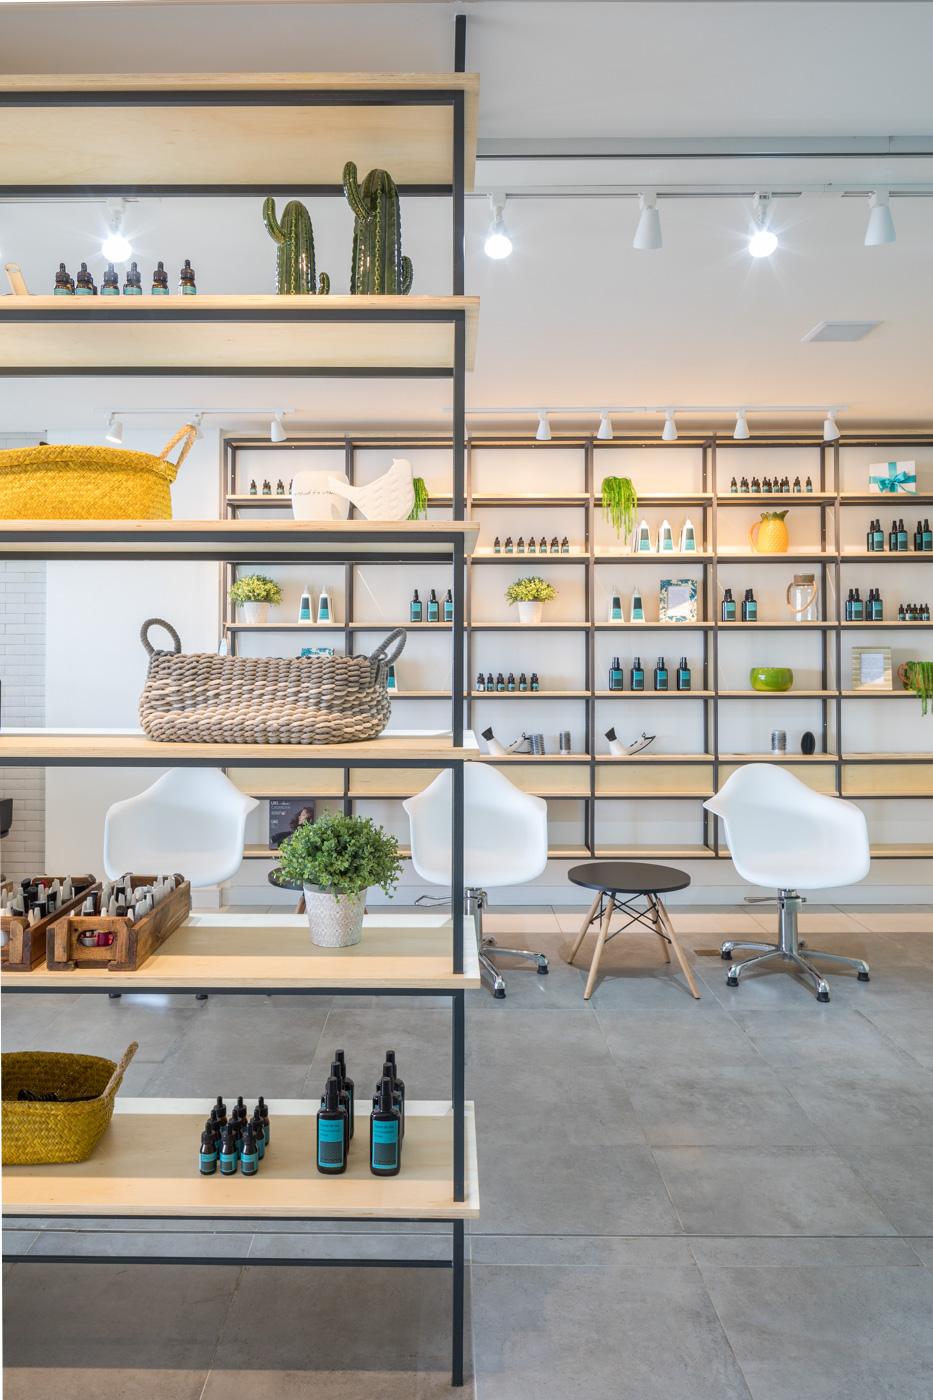 Estúdio-Mova-arquitetura-interiores-comercial-foto-haruo-mikami_125_Baixa.jpg